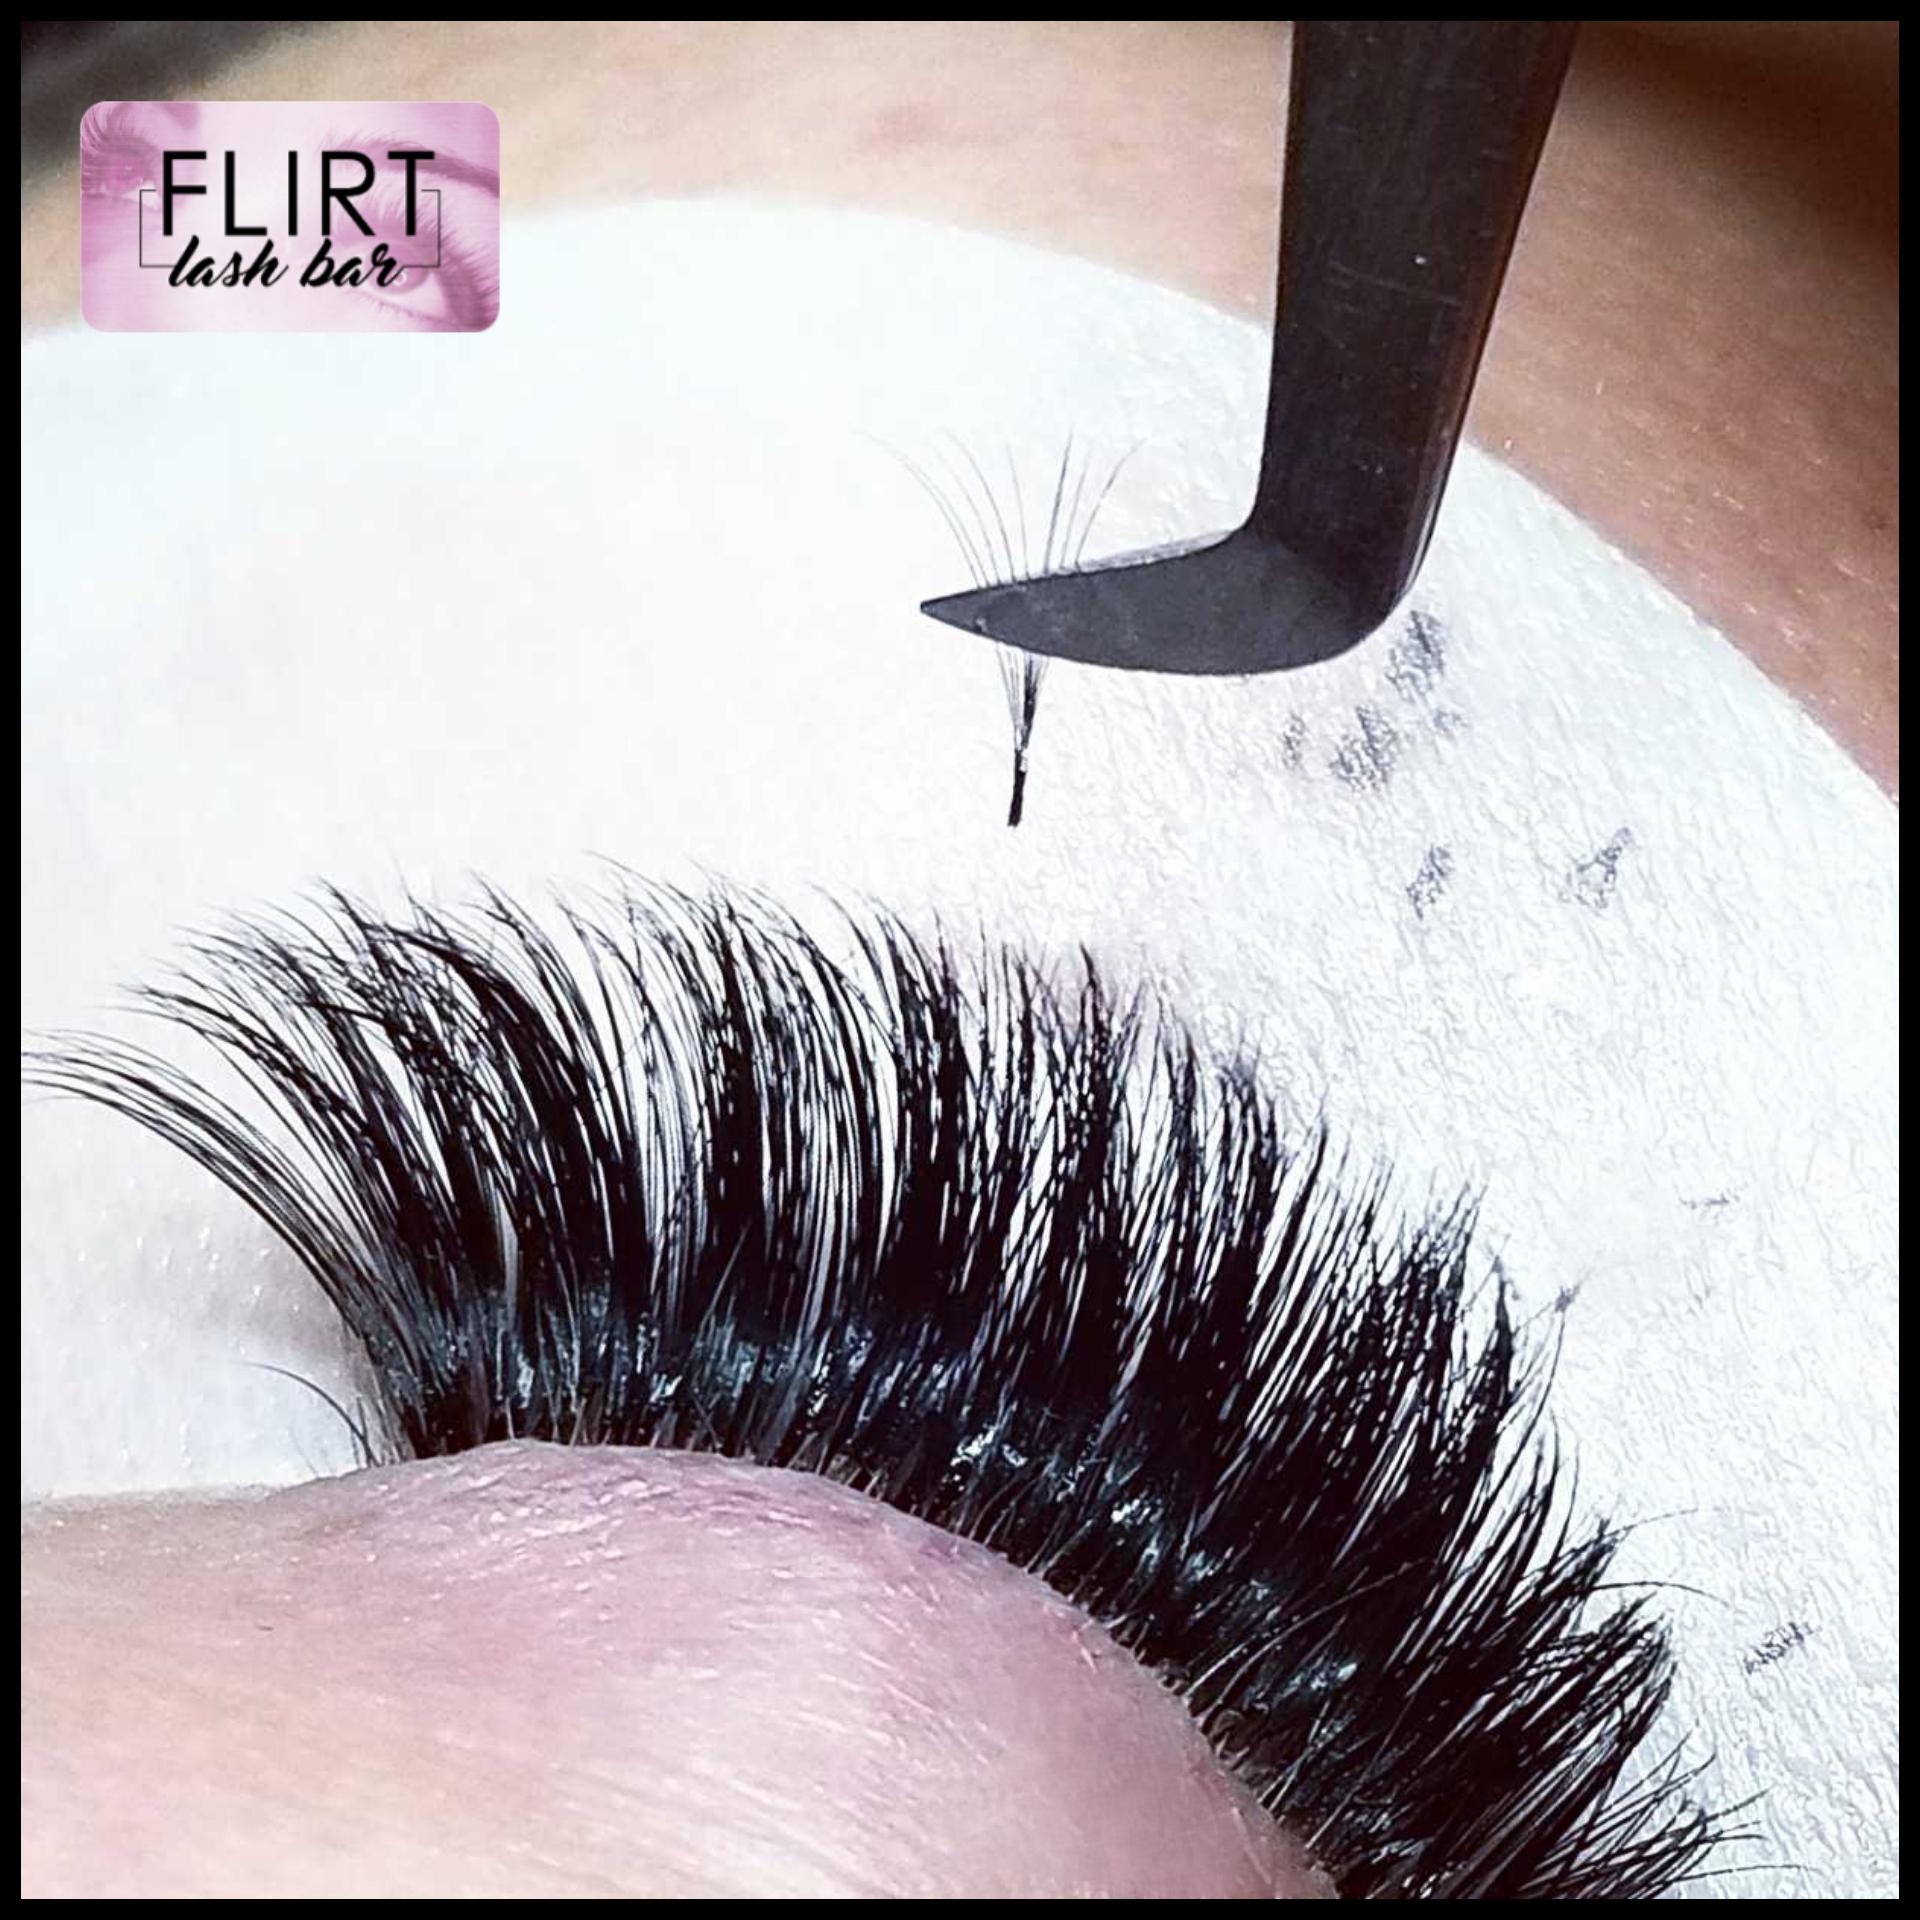 Flirt Lash Bar - Best Eyelash Extensions - Long Beach - Los Angeles